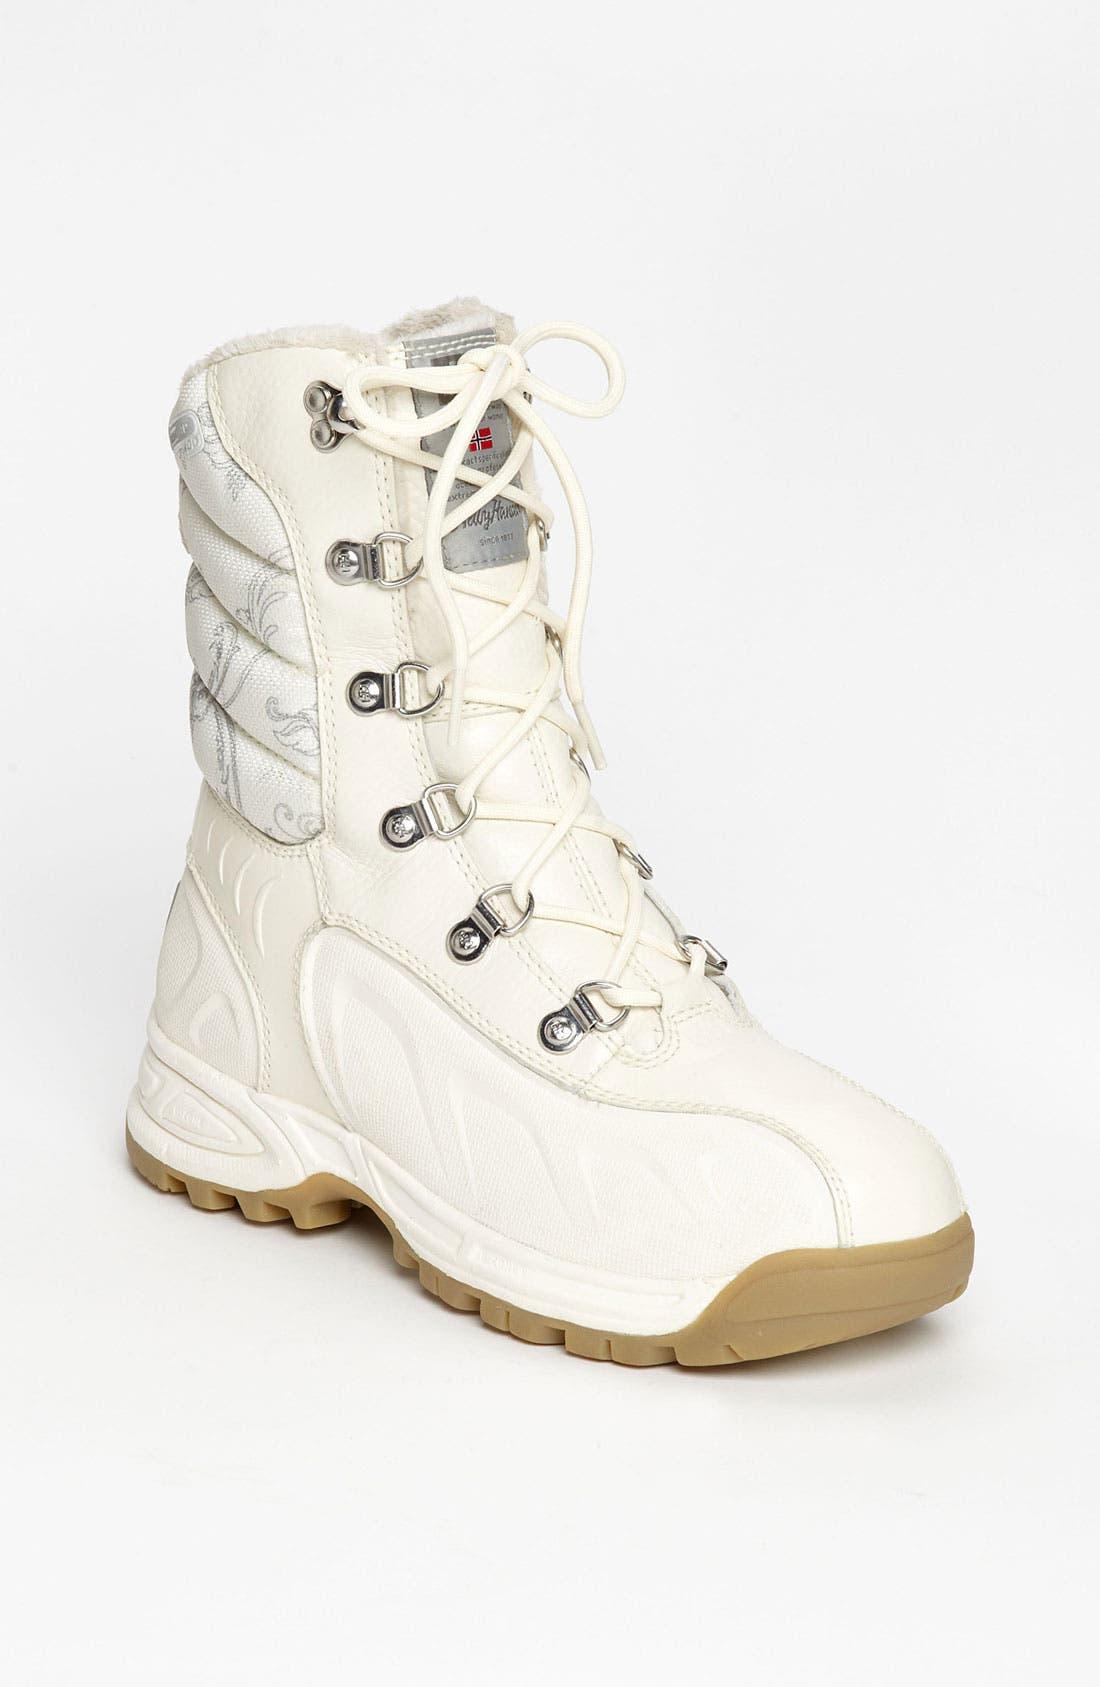 Alternate Image 1 Selected - Helly Hansen 'Lynx' Boot